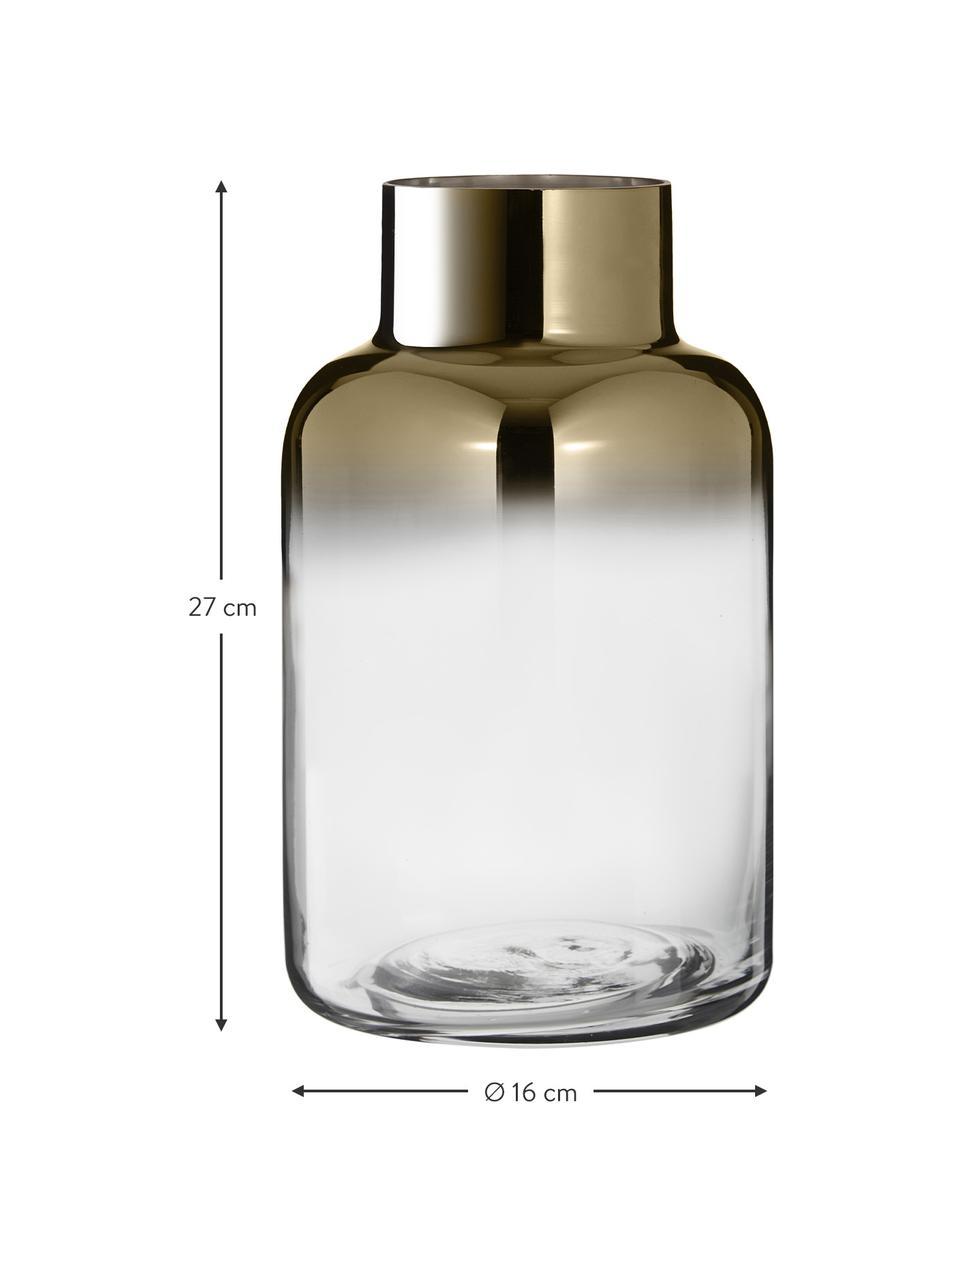 Mundgeblasene Glasvase Uma, Glas, Transparent, Goldfarben, Ø 16 x H 27 cm